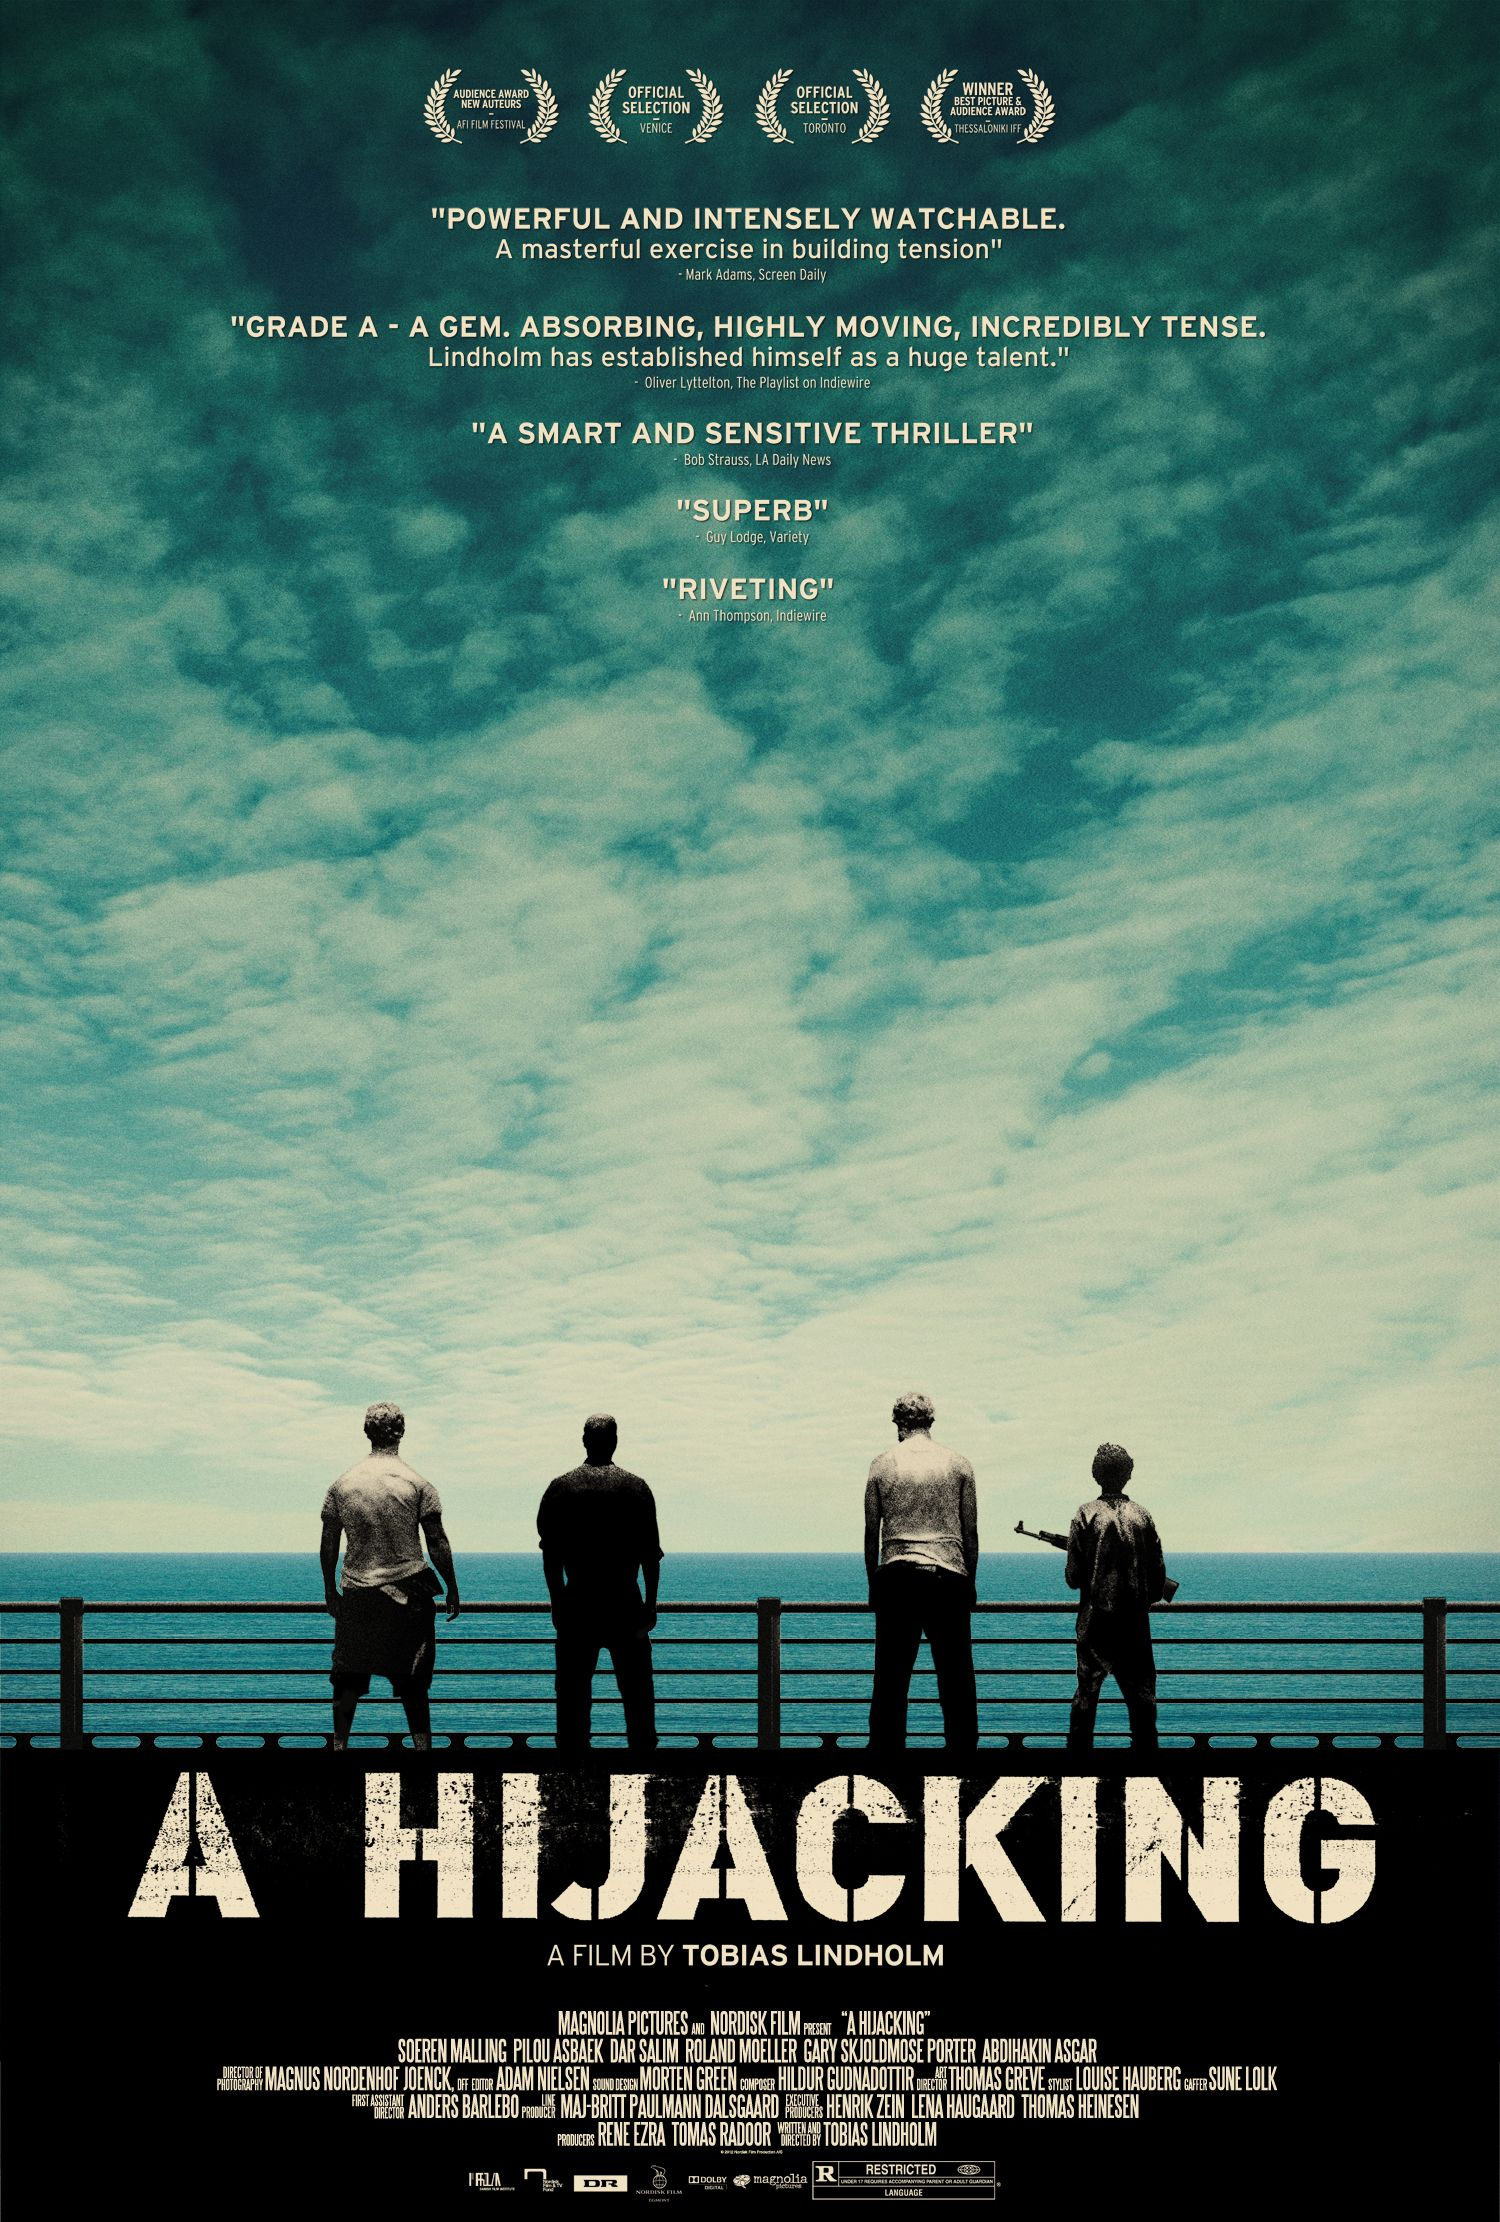 A Hijacking - 2012 BDRip x264 - Türkçe Altyazılı Tek Link indir